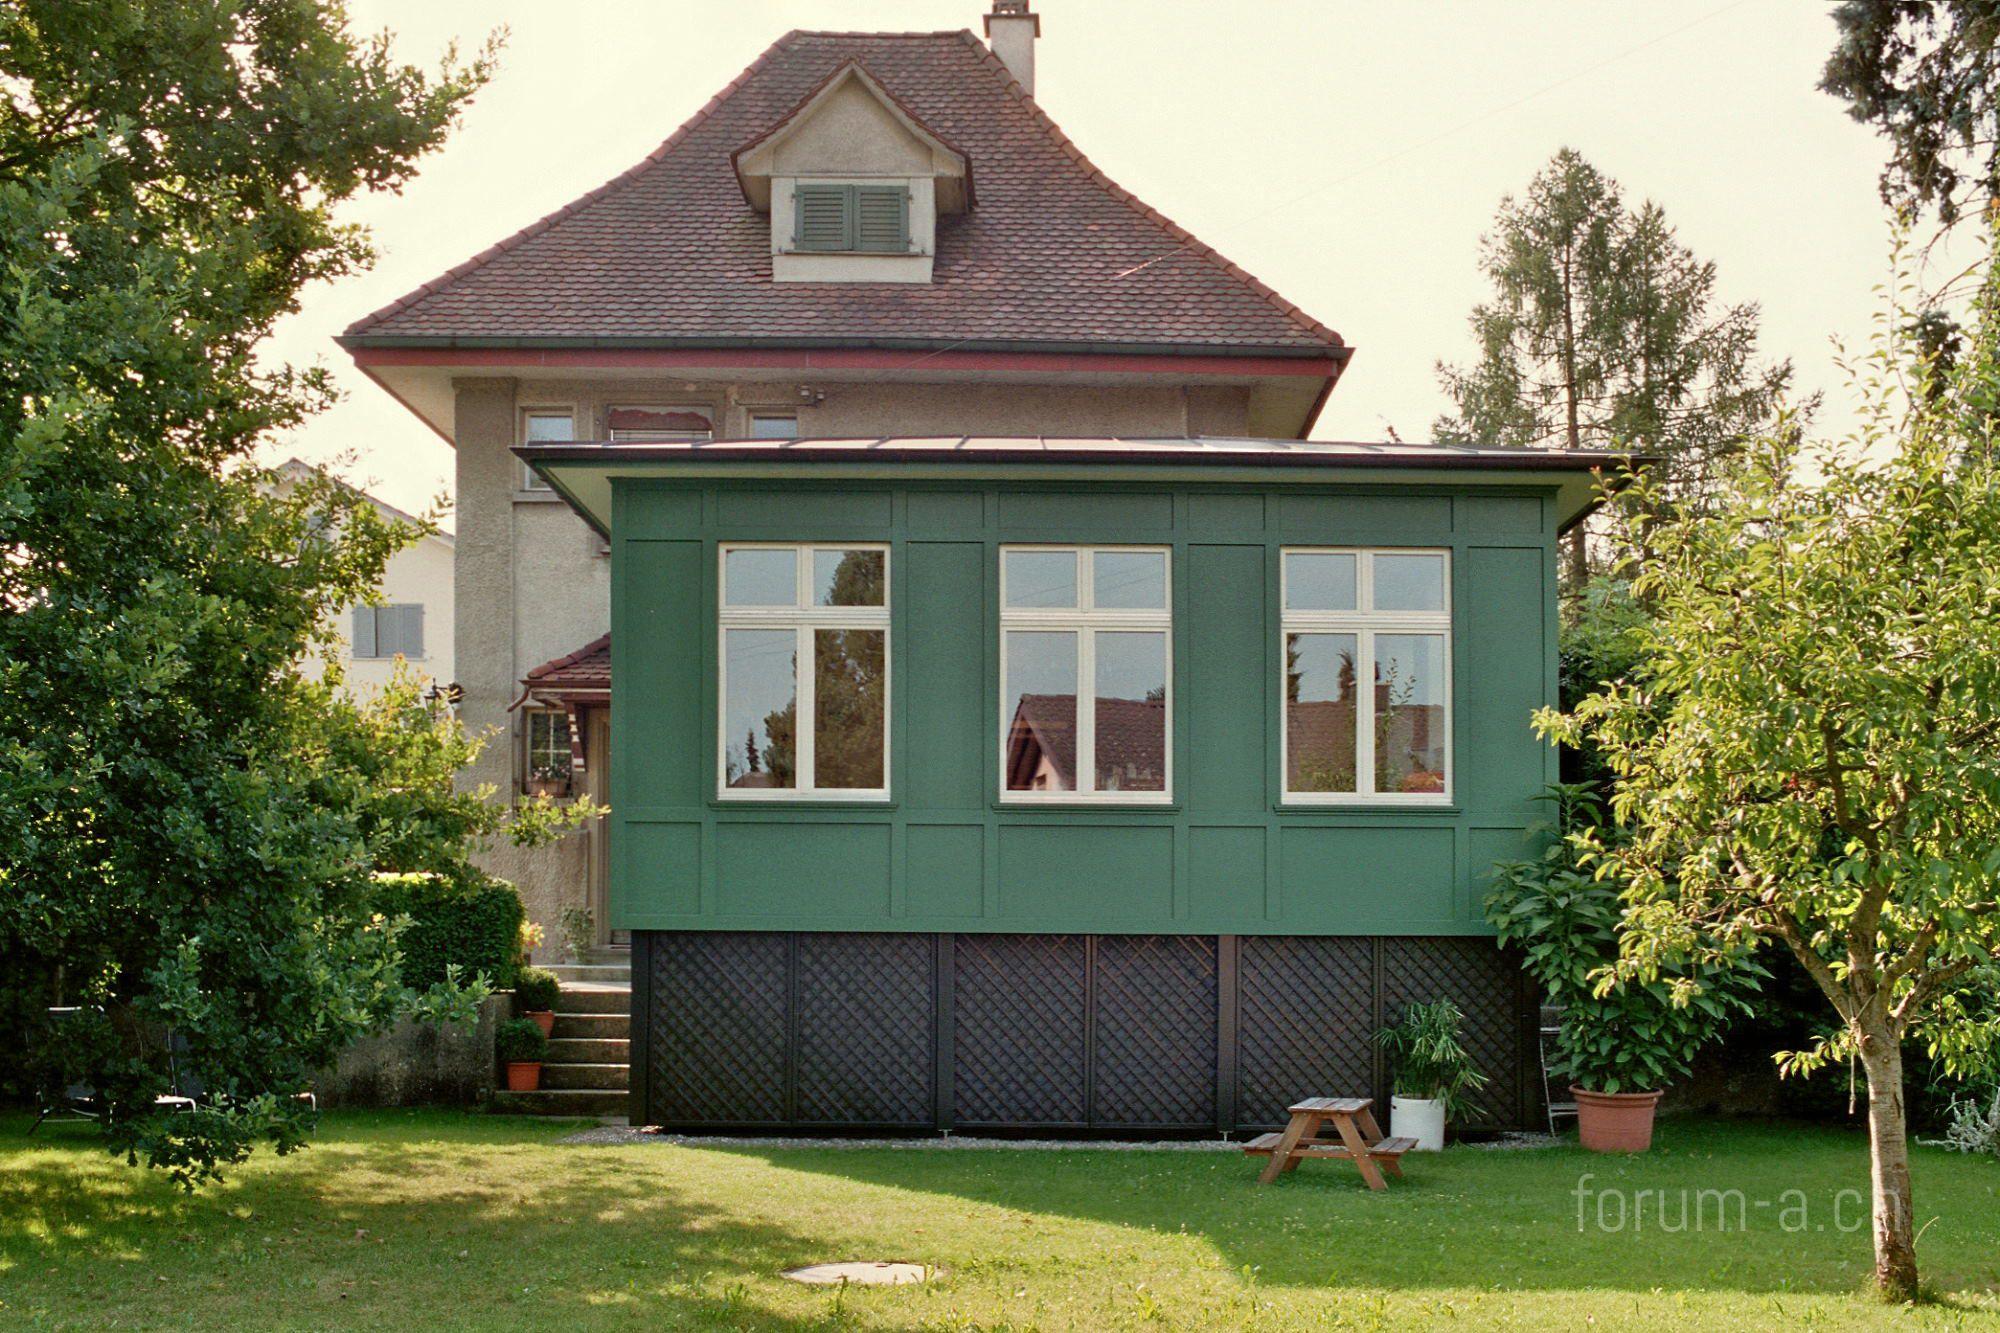 hausanbau holz best anbau holz with hausanbau holz latest traumhaftes auf der familiren axalp. Black Bedroom Furniture Sets. Home Design Ideas